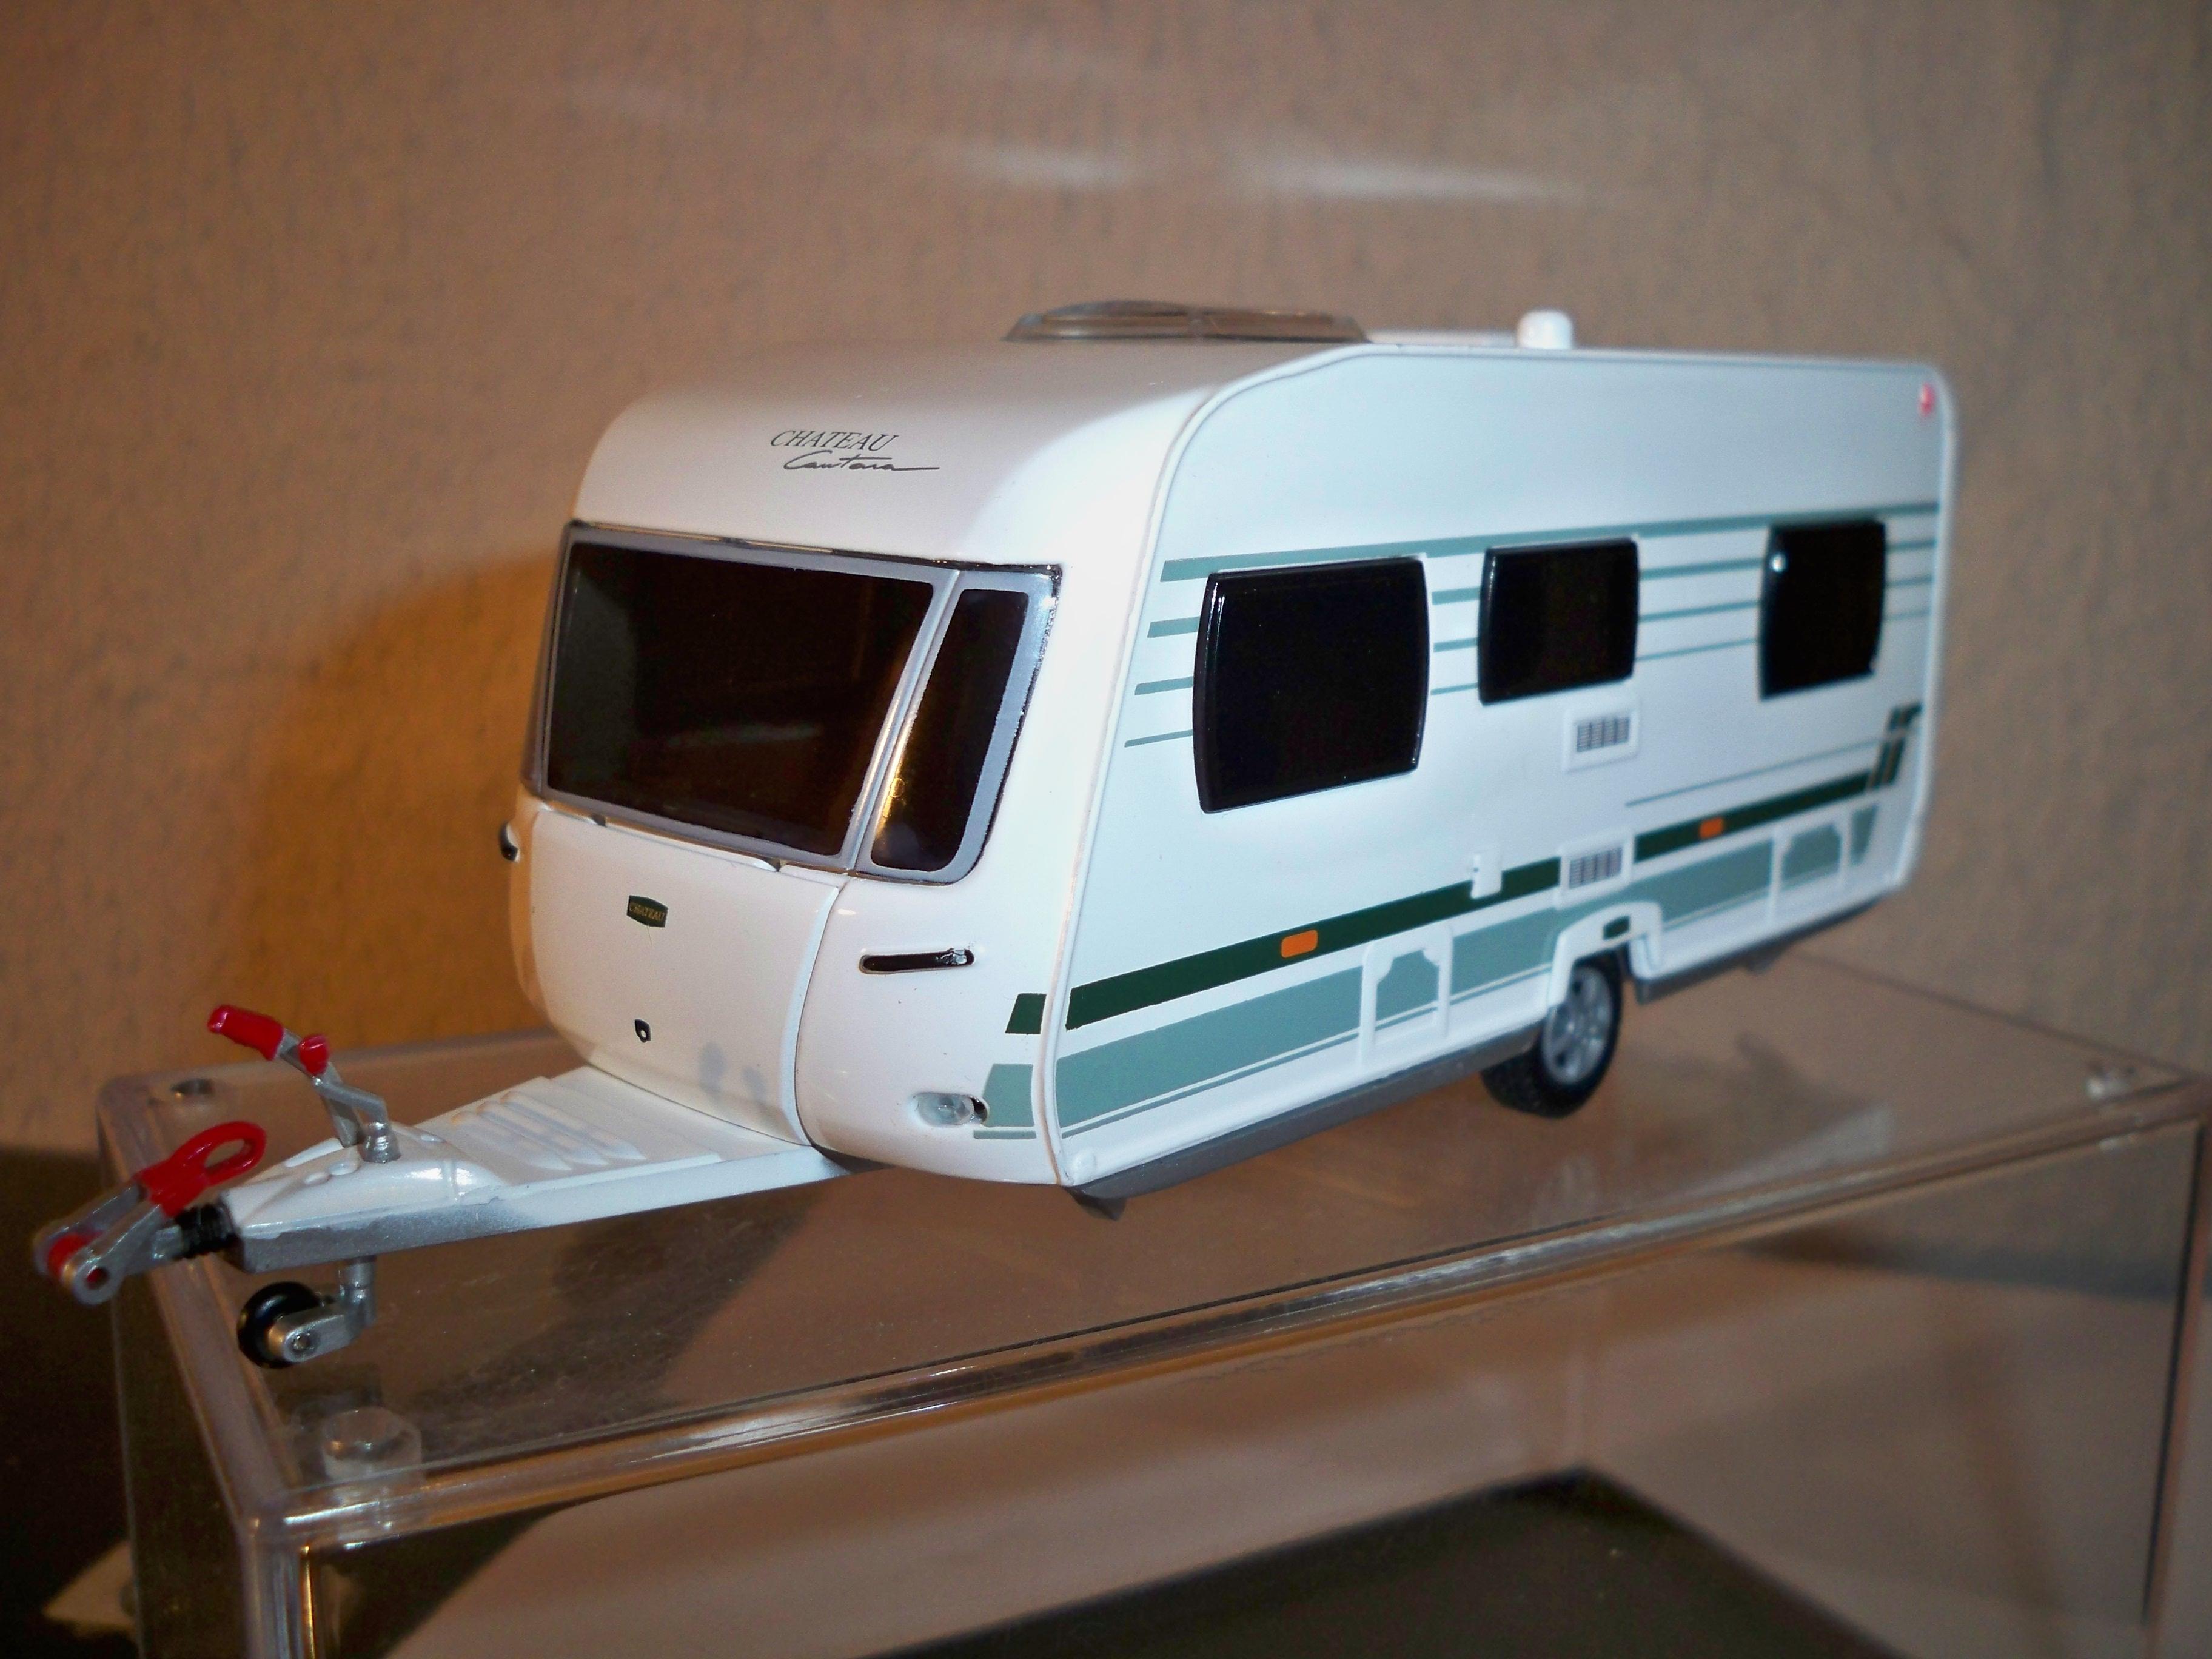 Lion Toys Atrelado Caravan Li Cantara Model Trailers And Caravans F F D F D B A A B B F on Green Dodge Caravan